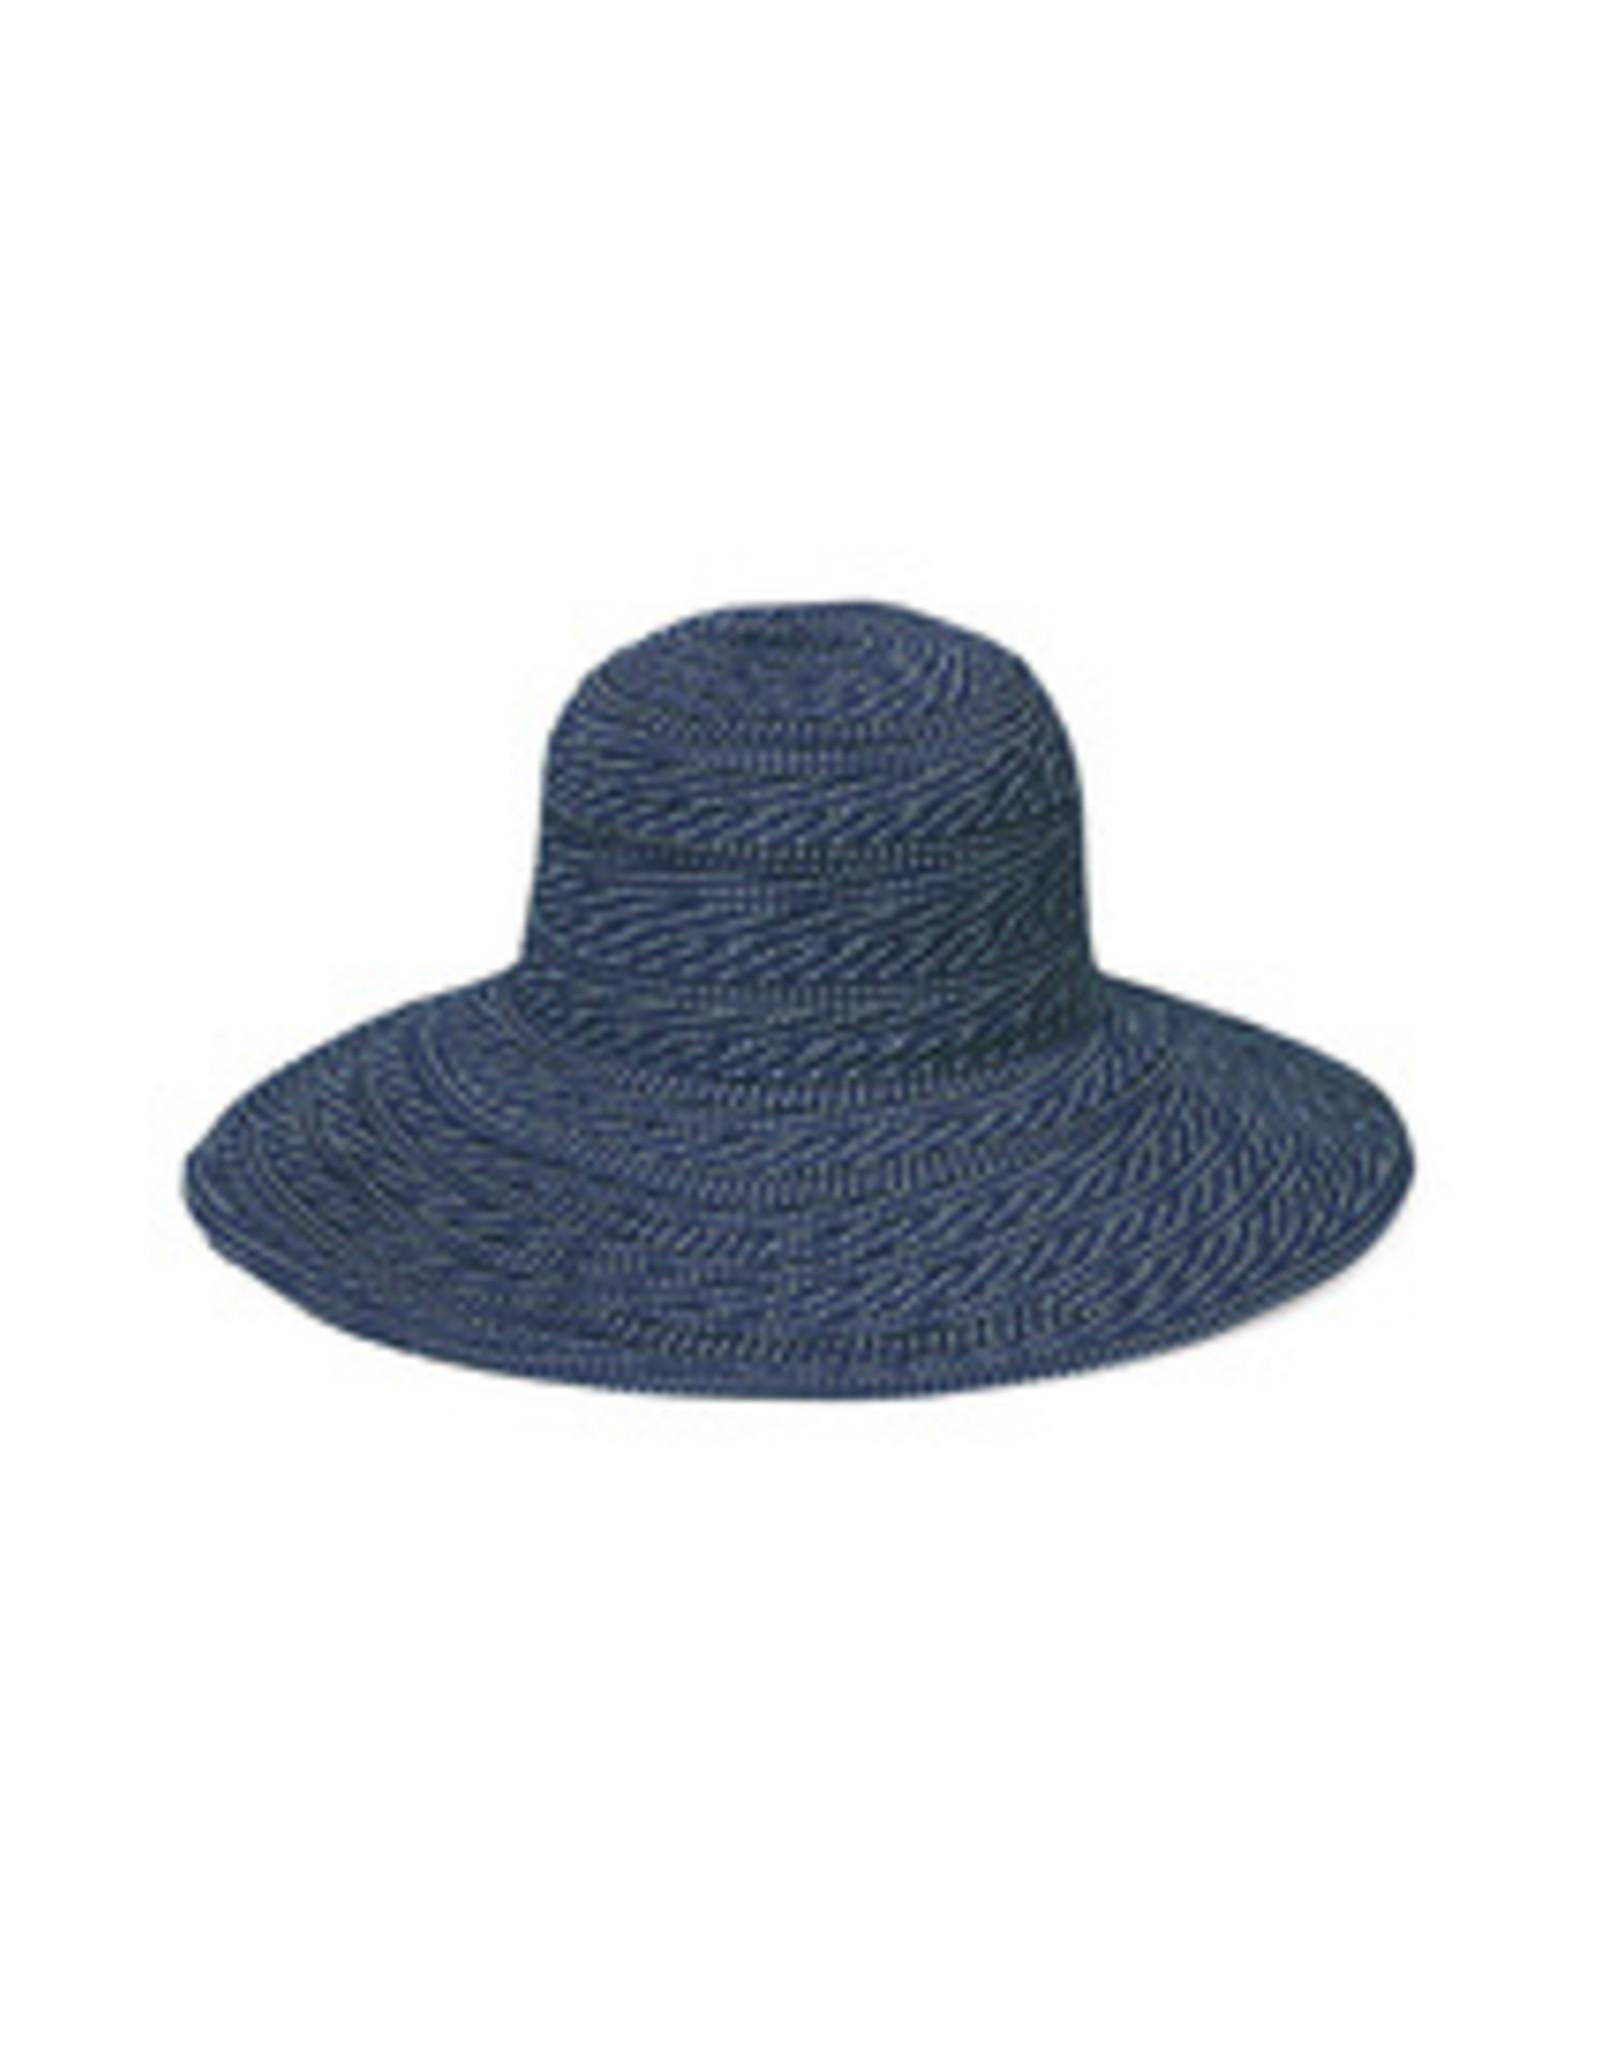 Wallaroo Hat Co Scrunchie Navy/White Dots